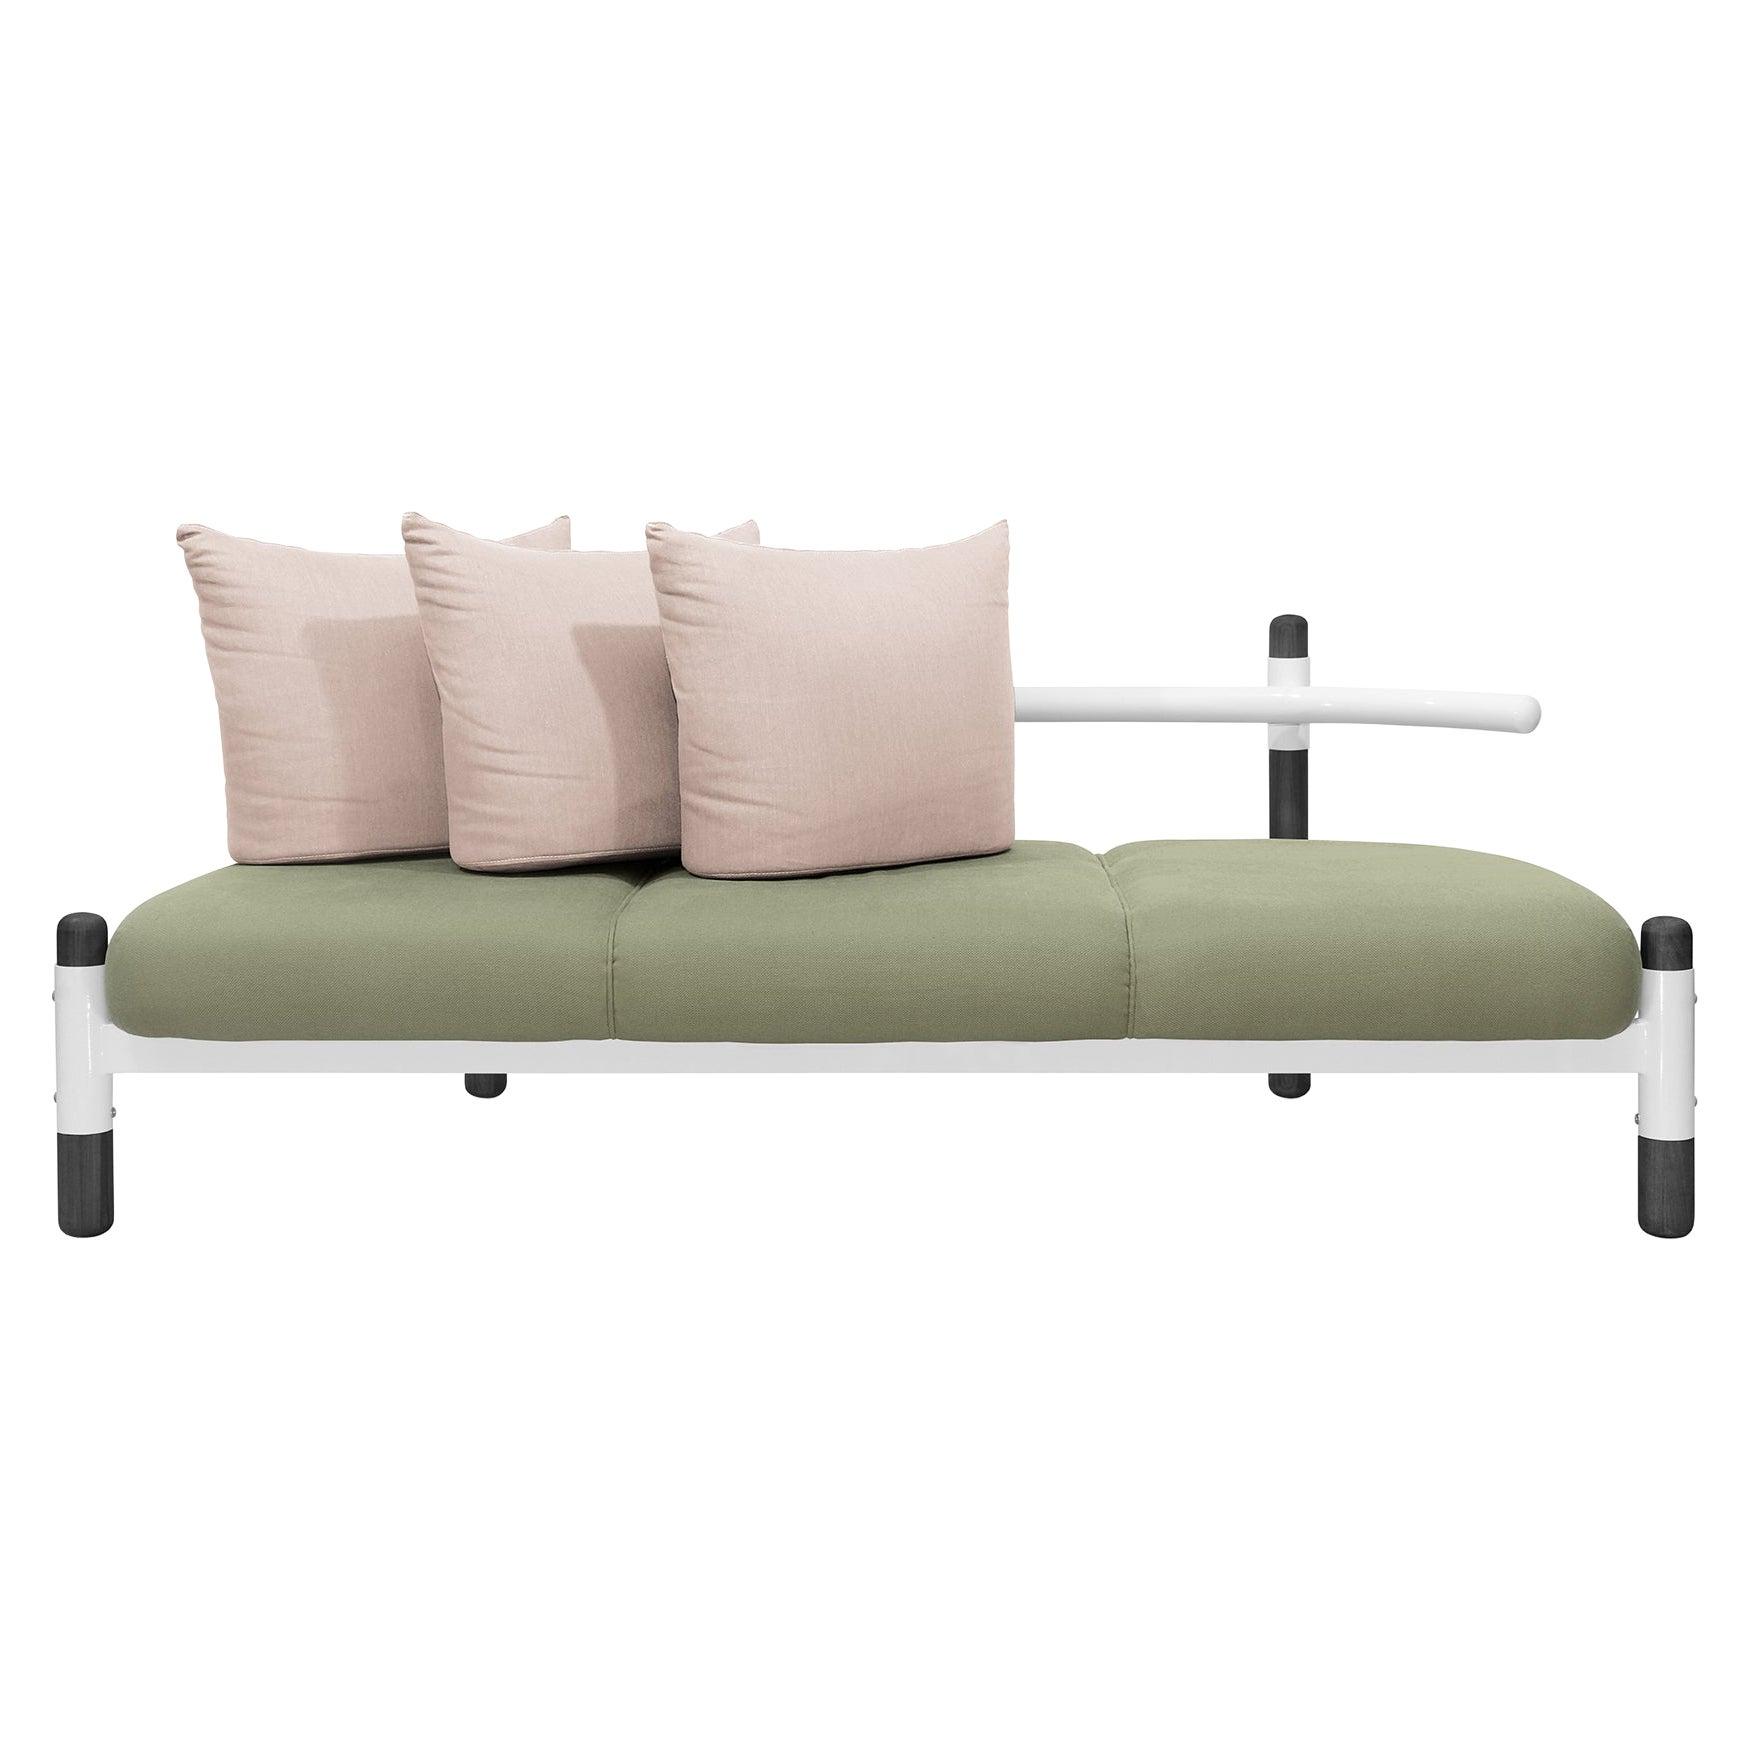 Green PK15 Three-Seat Sofa, Steel Structure and Ebonized Legs by Paulo Kobylka